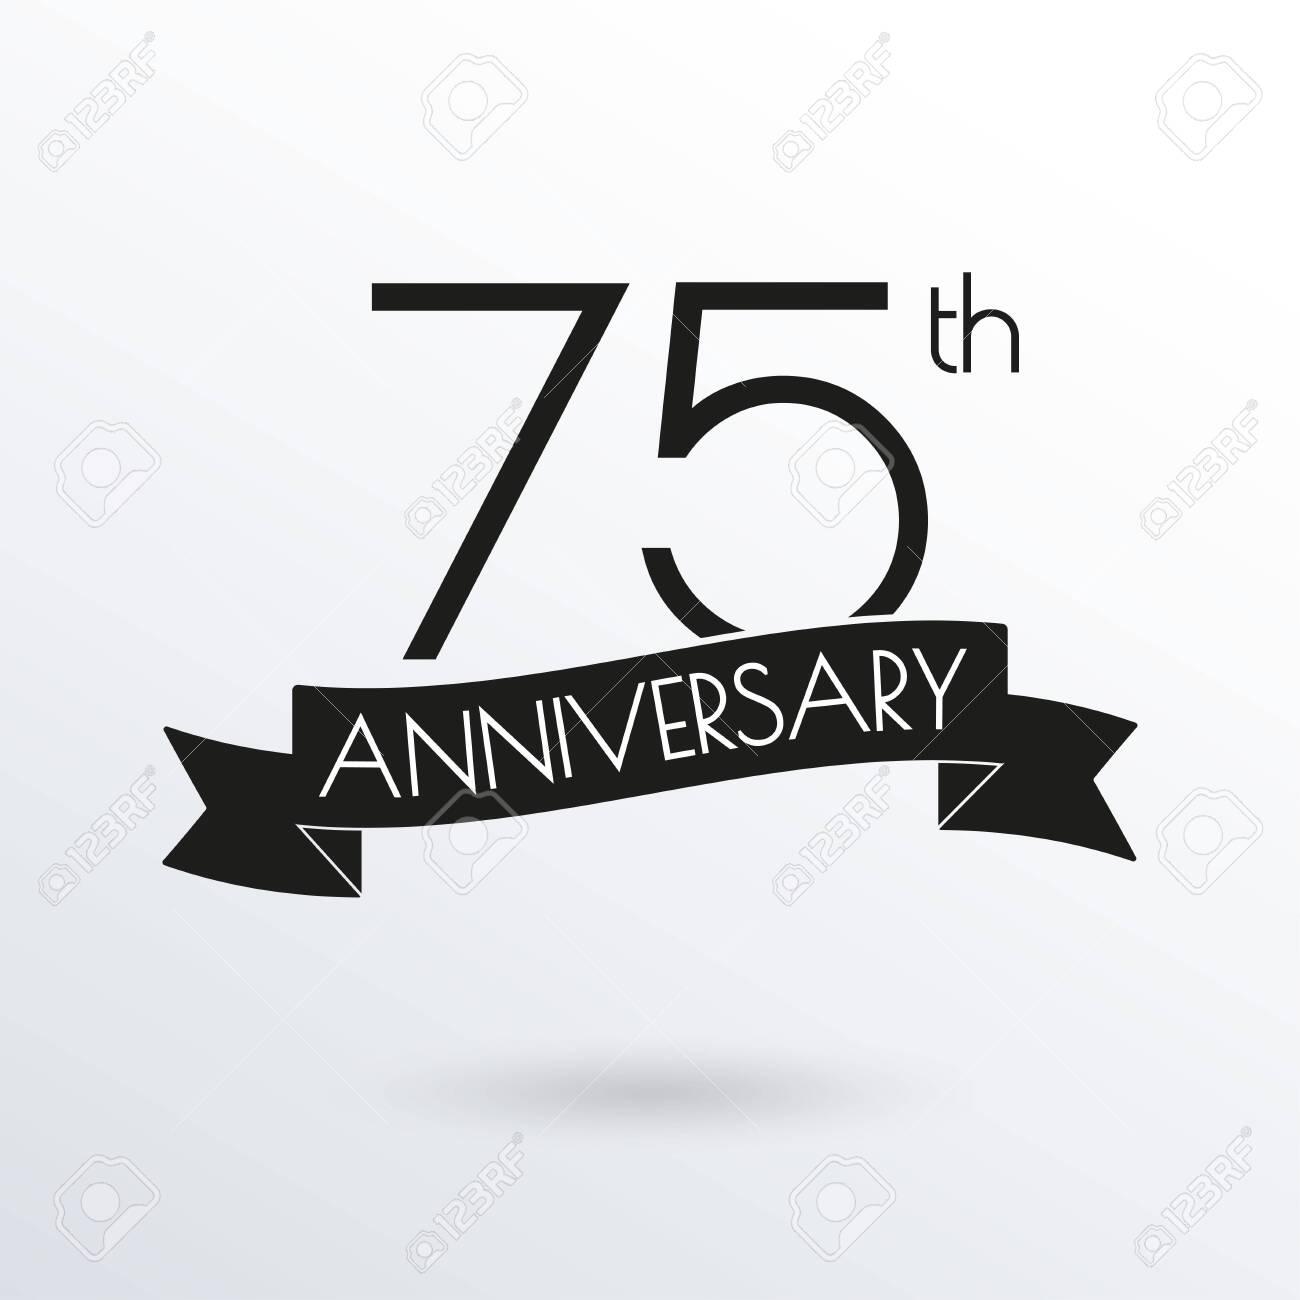 75 years anniversary logo with ribbon 75th anniversary celebration